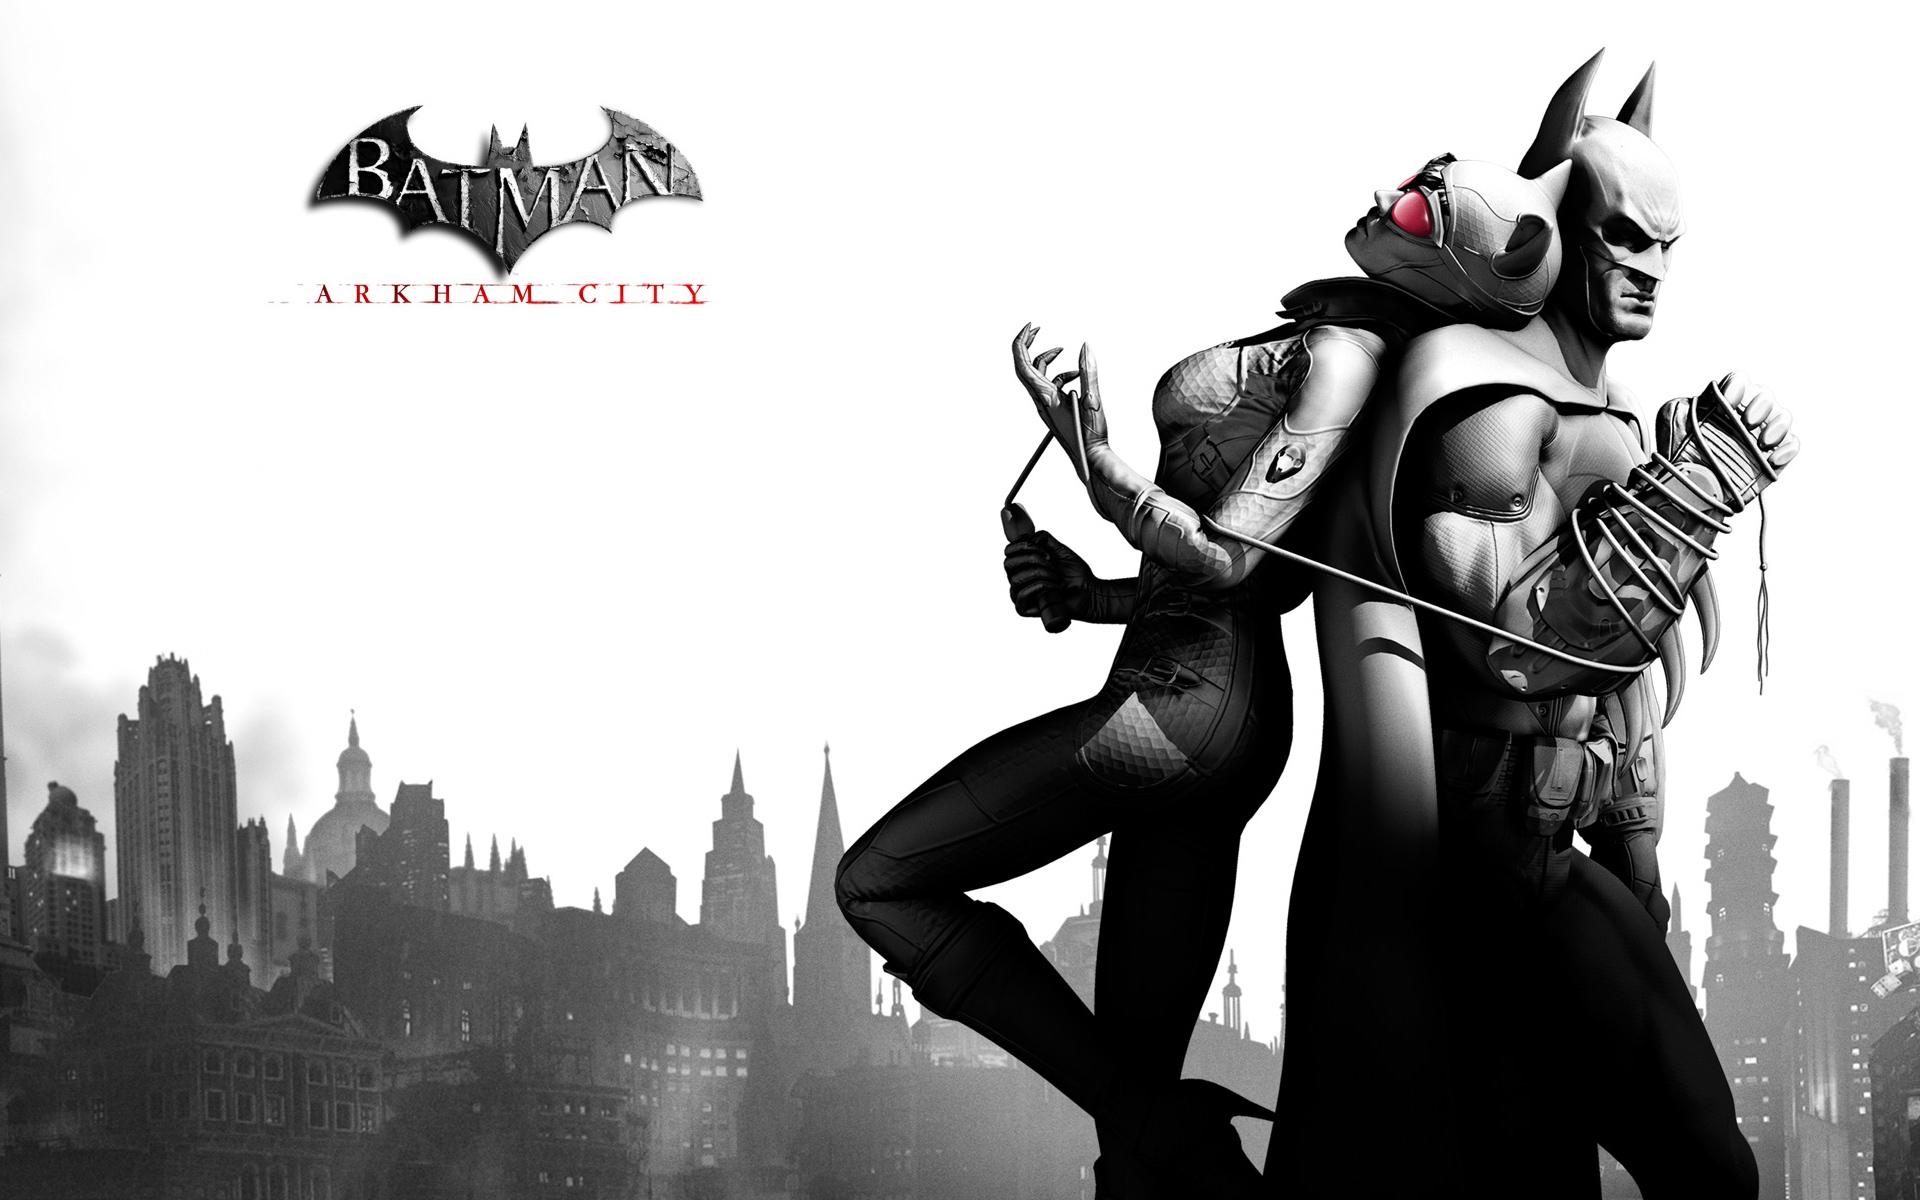 Batman Arkham City Game Hd Wallpaper